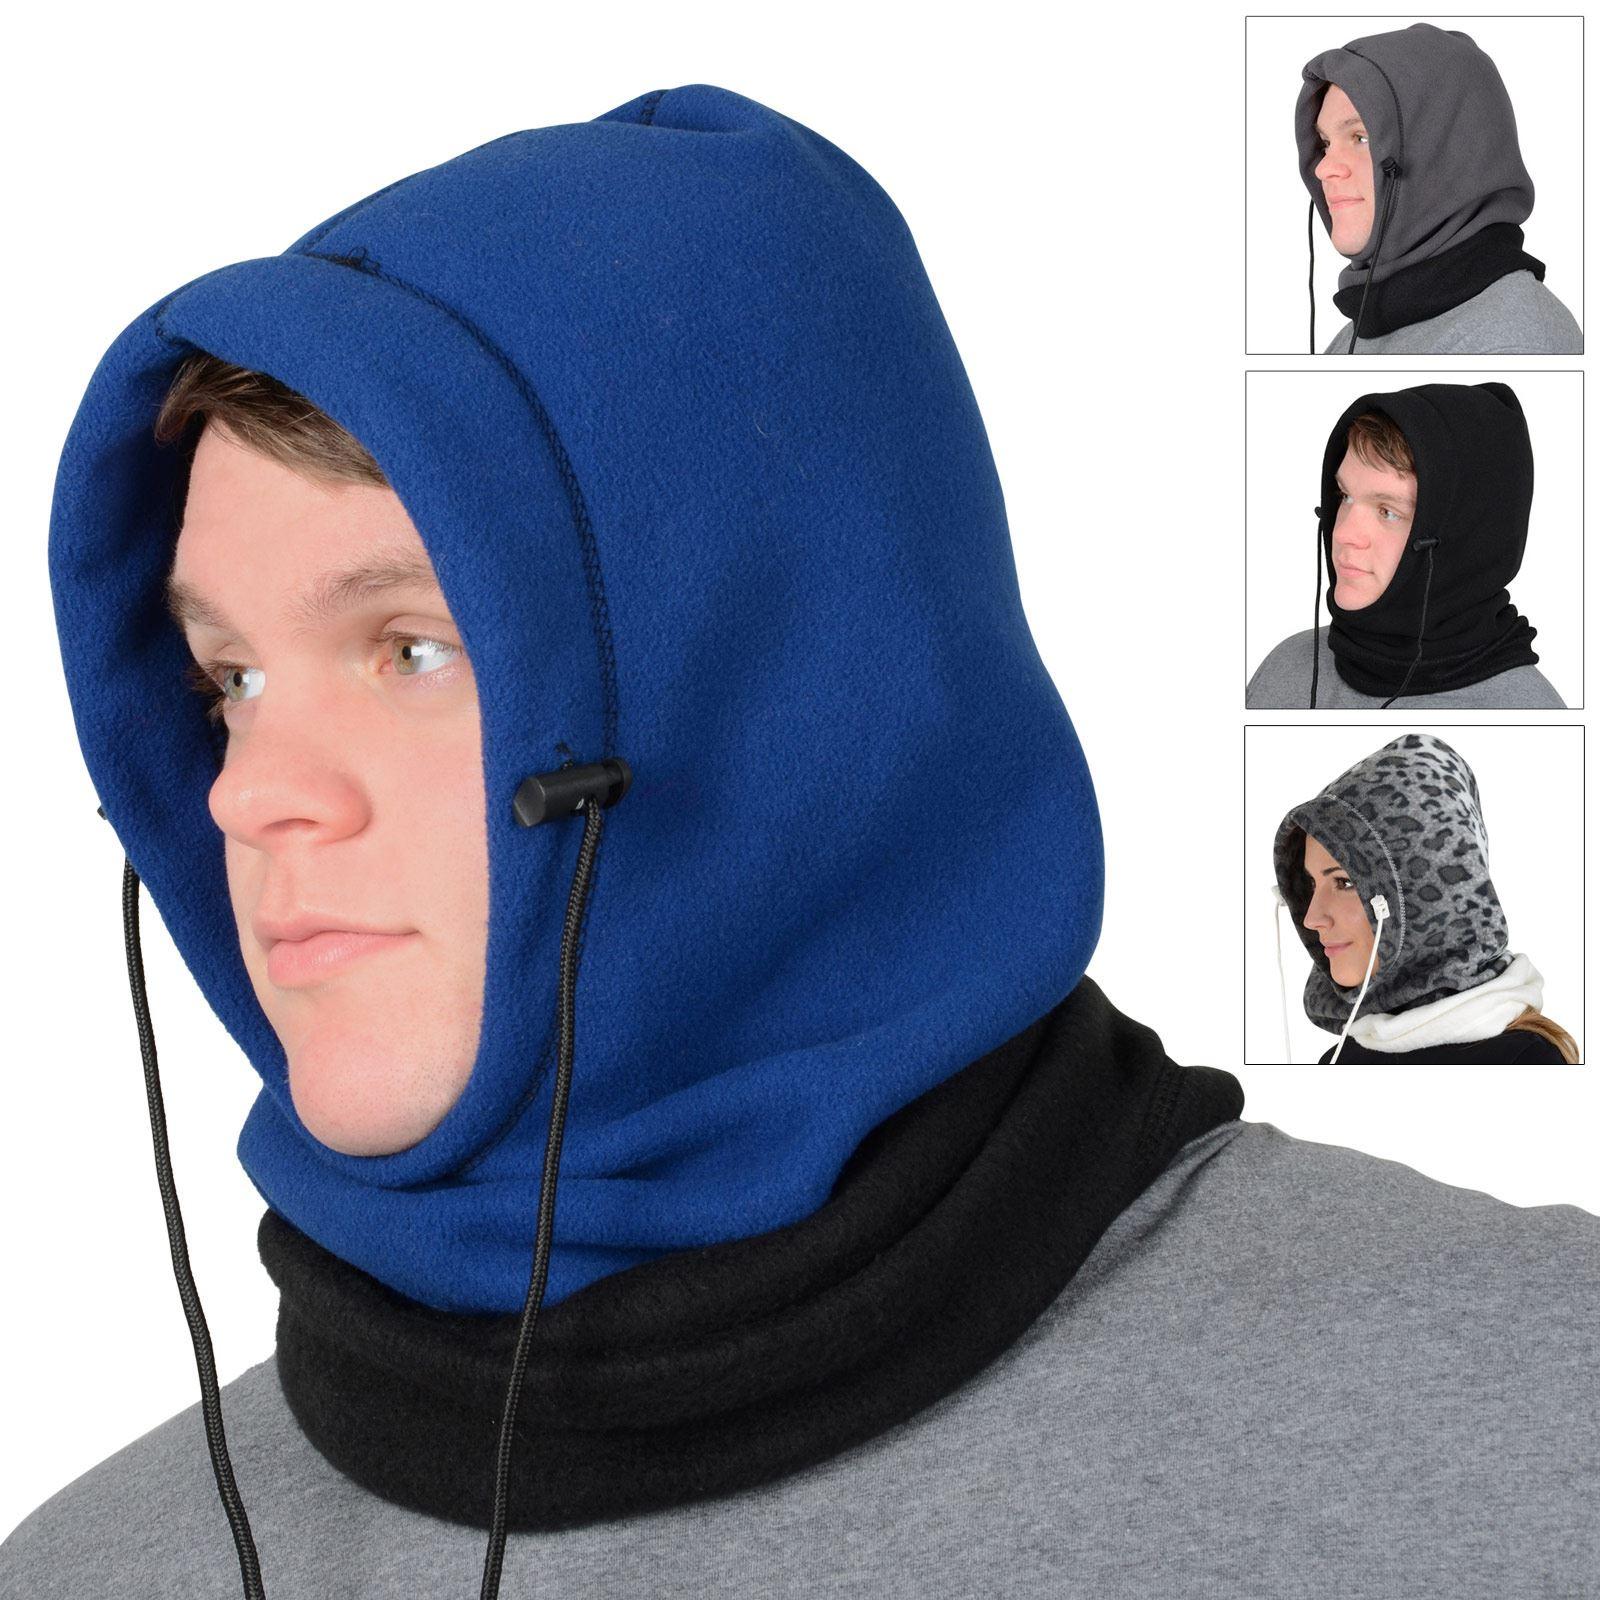 ARCTIC-X 6-in-1 Fleece Hood balaclava Facemask Beanie Scarf Hood Bag Winter Cold